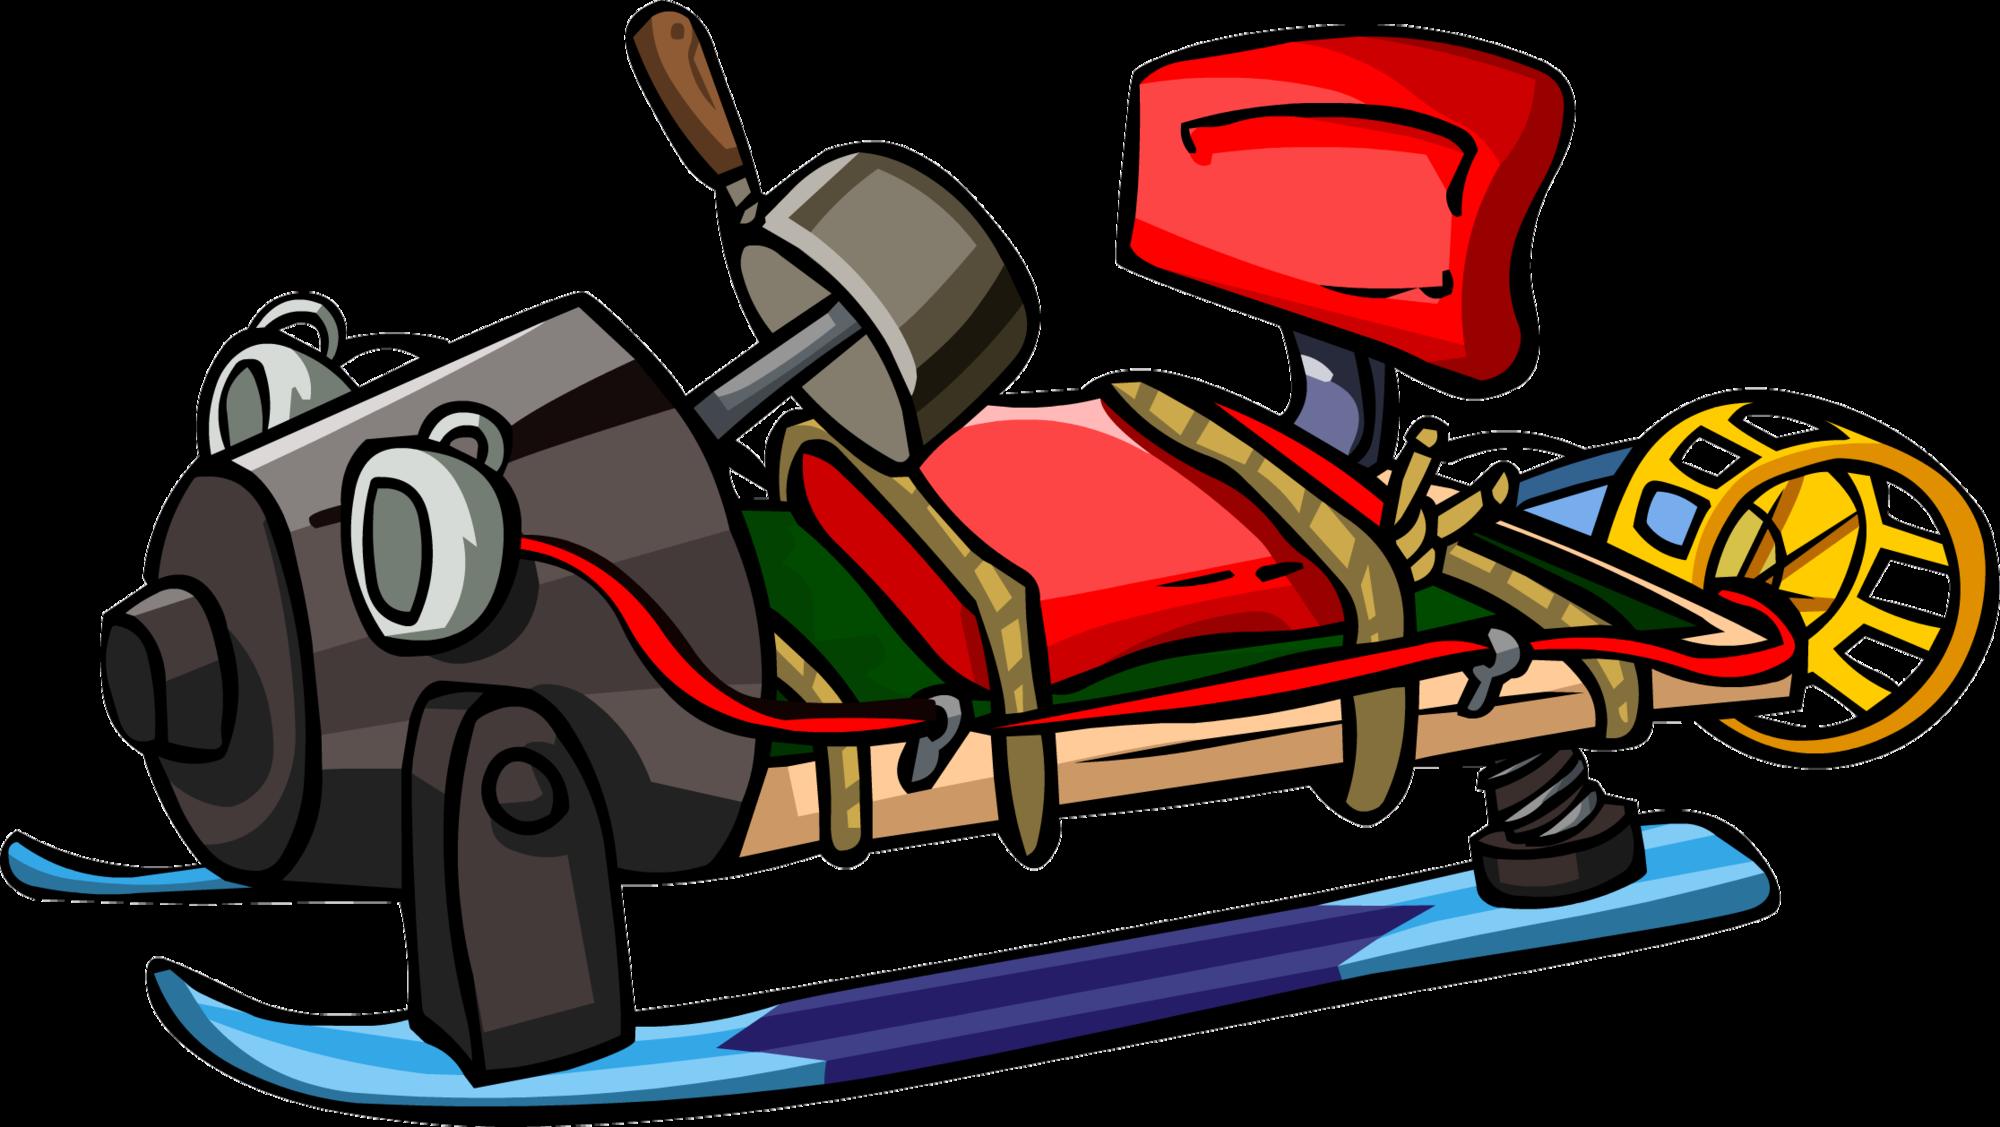 Missions clipart secret mission. Prototype sled club penguin